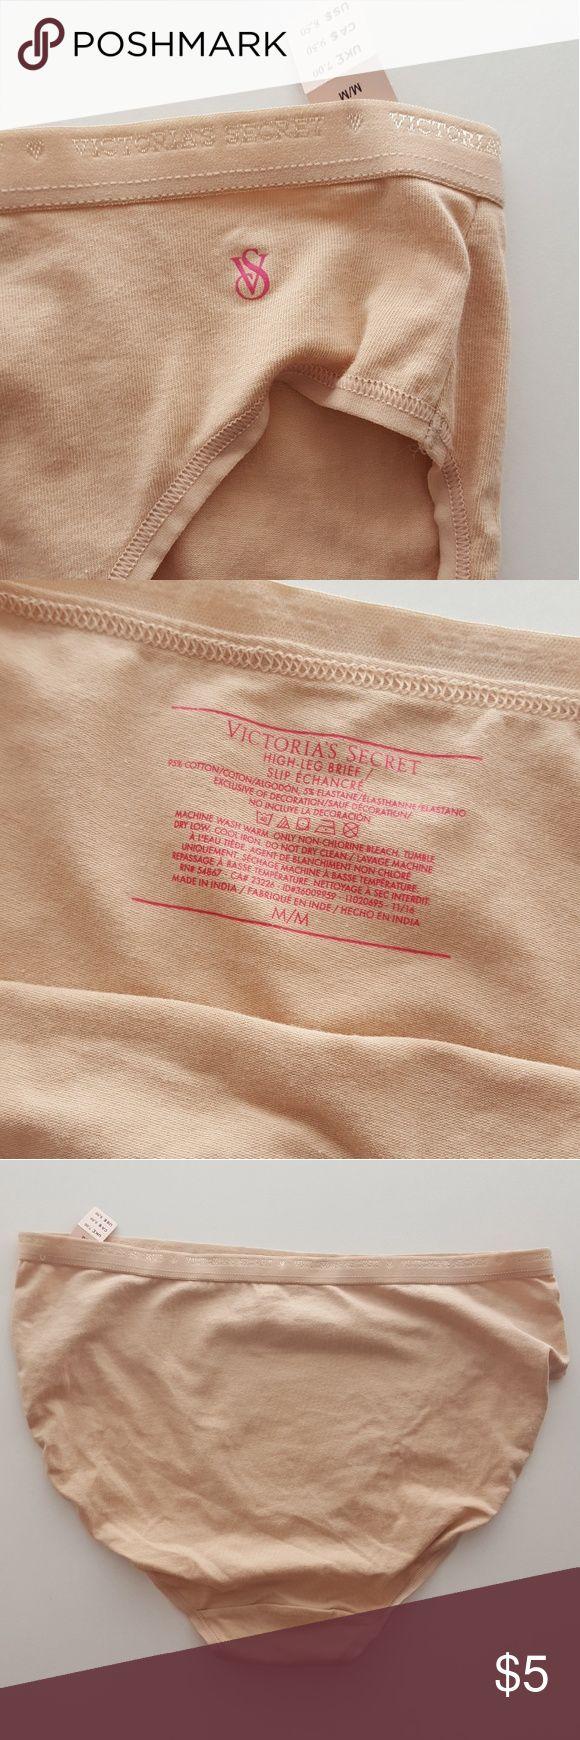 Victoria's Secret High-leg Brief NWT Victoria's Secret High-leg Brief Size: medium, NWT Victoria's Secret Intimates & Sleepwear Panties